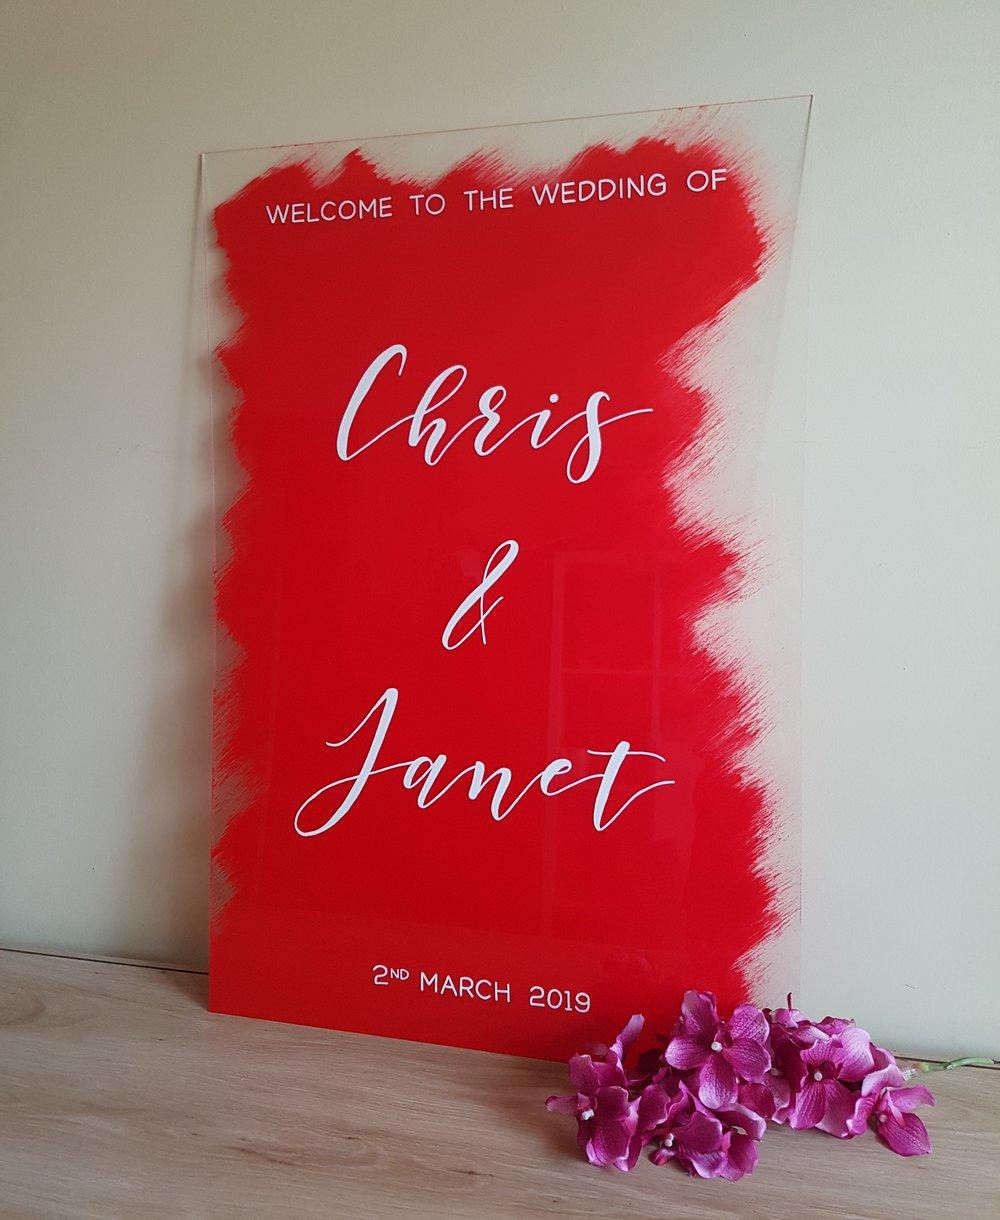 chris + janet.jpg